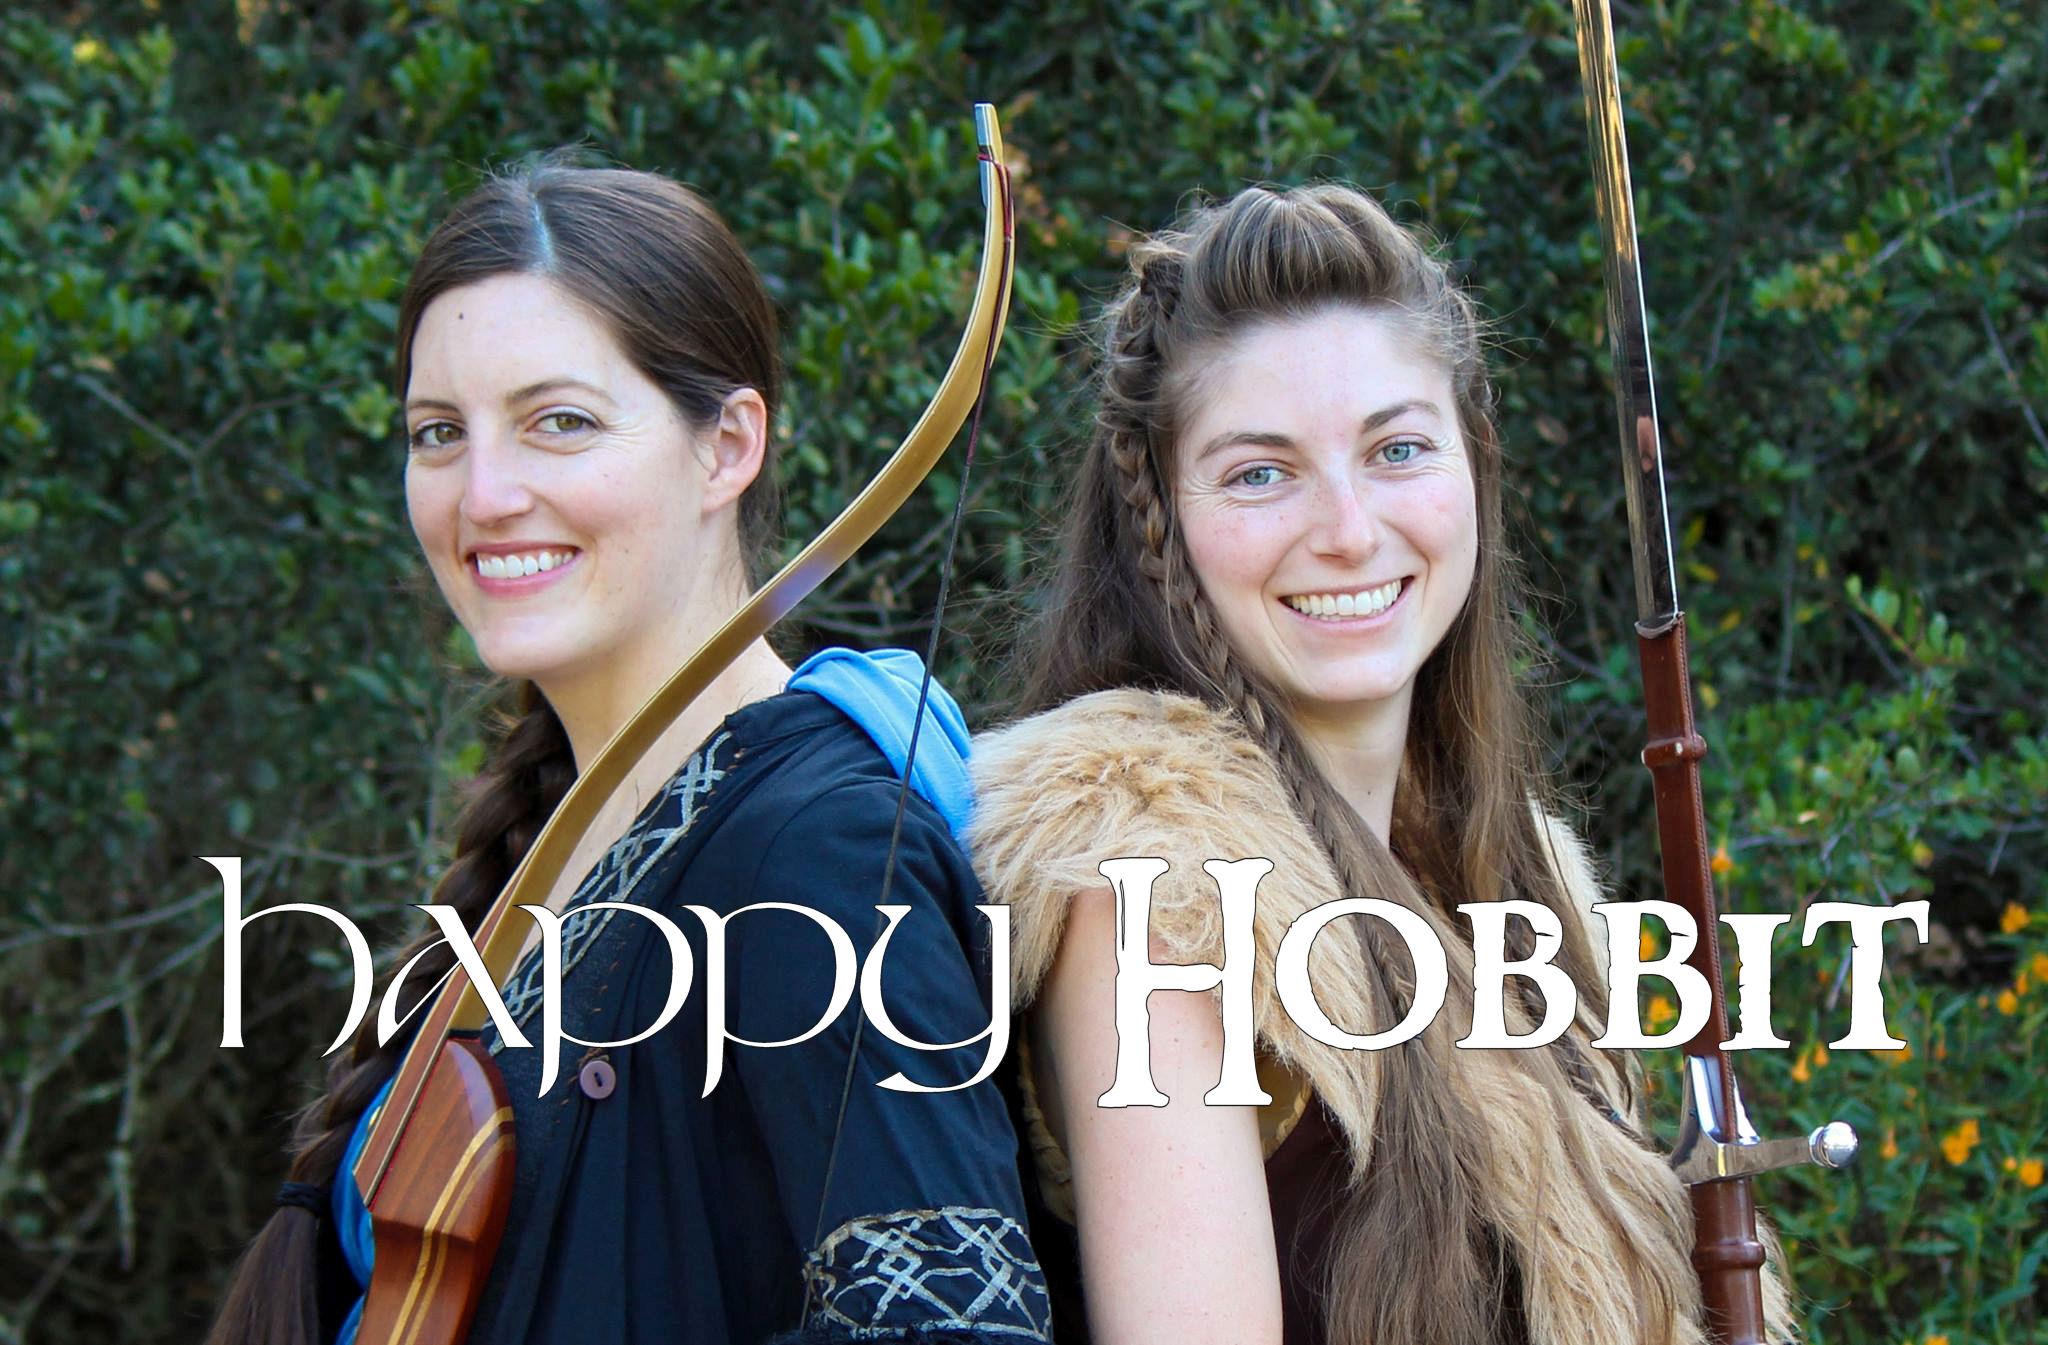 Hobbit gmail theme - Happy Hobbit New Dp2